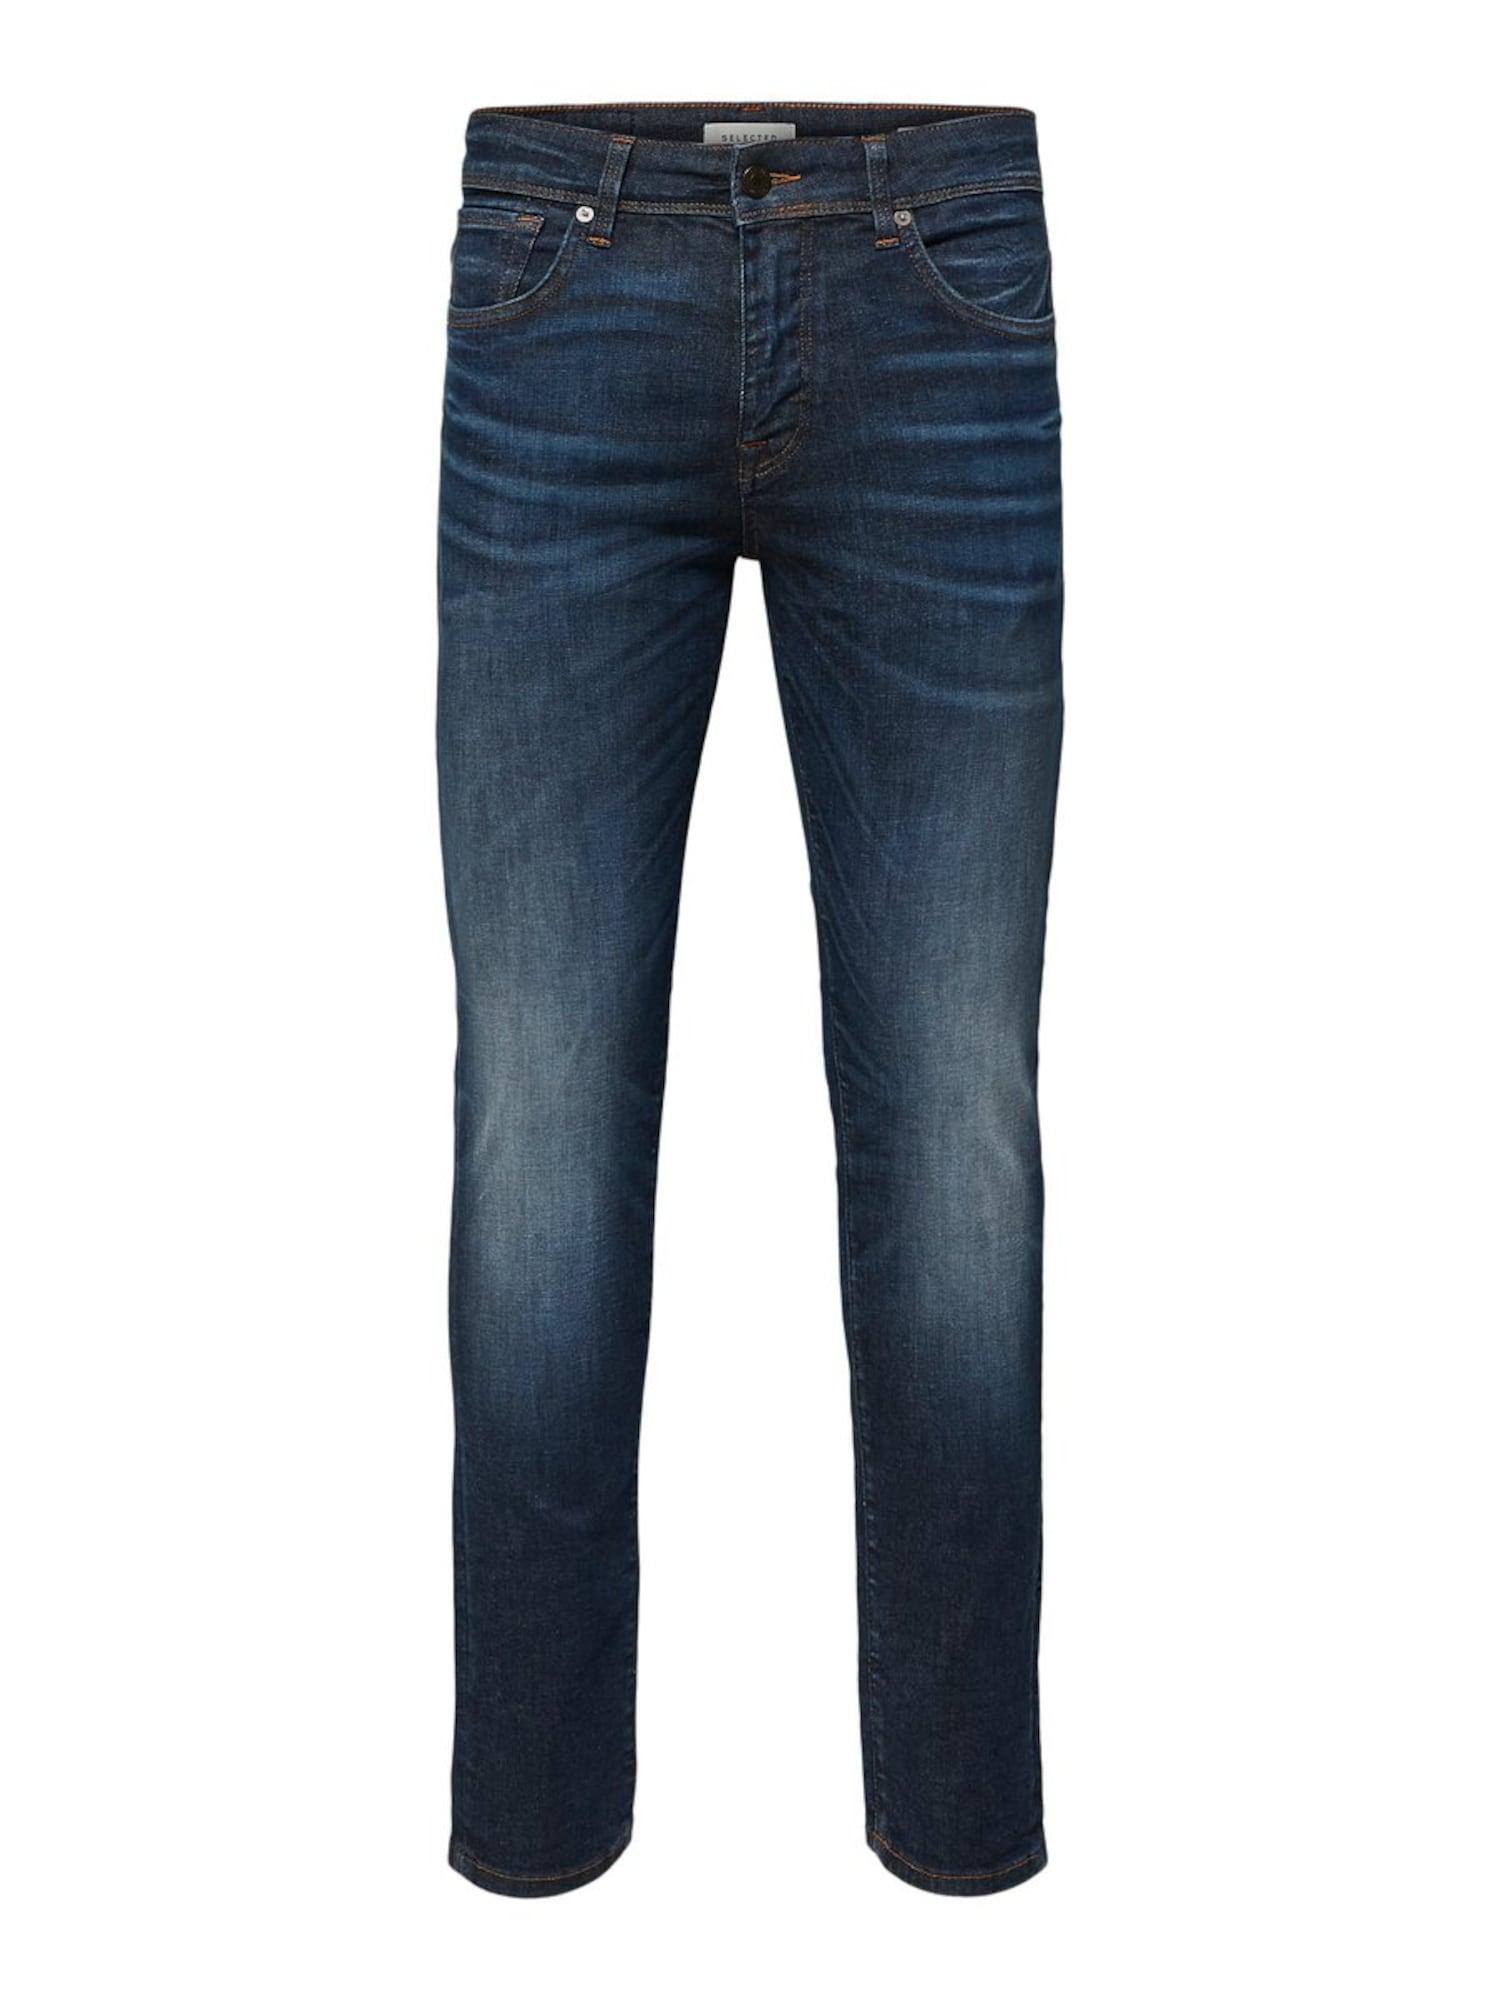 SELECTED HOMME Džinsai tamsiai (džinso) mėlyna